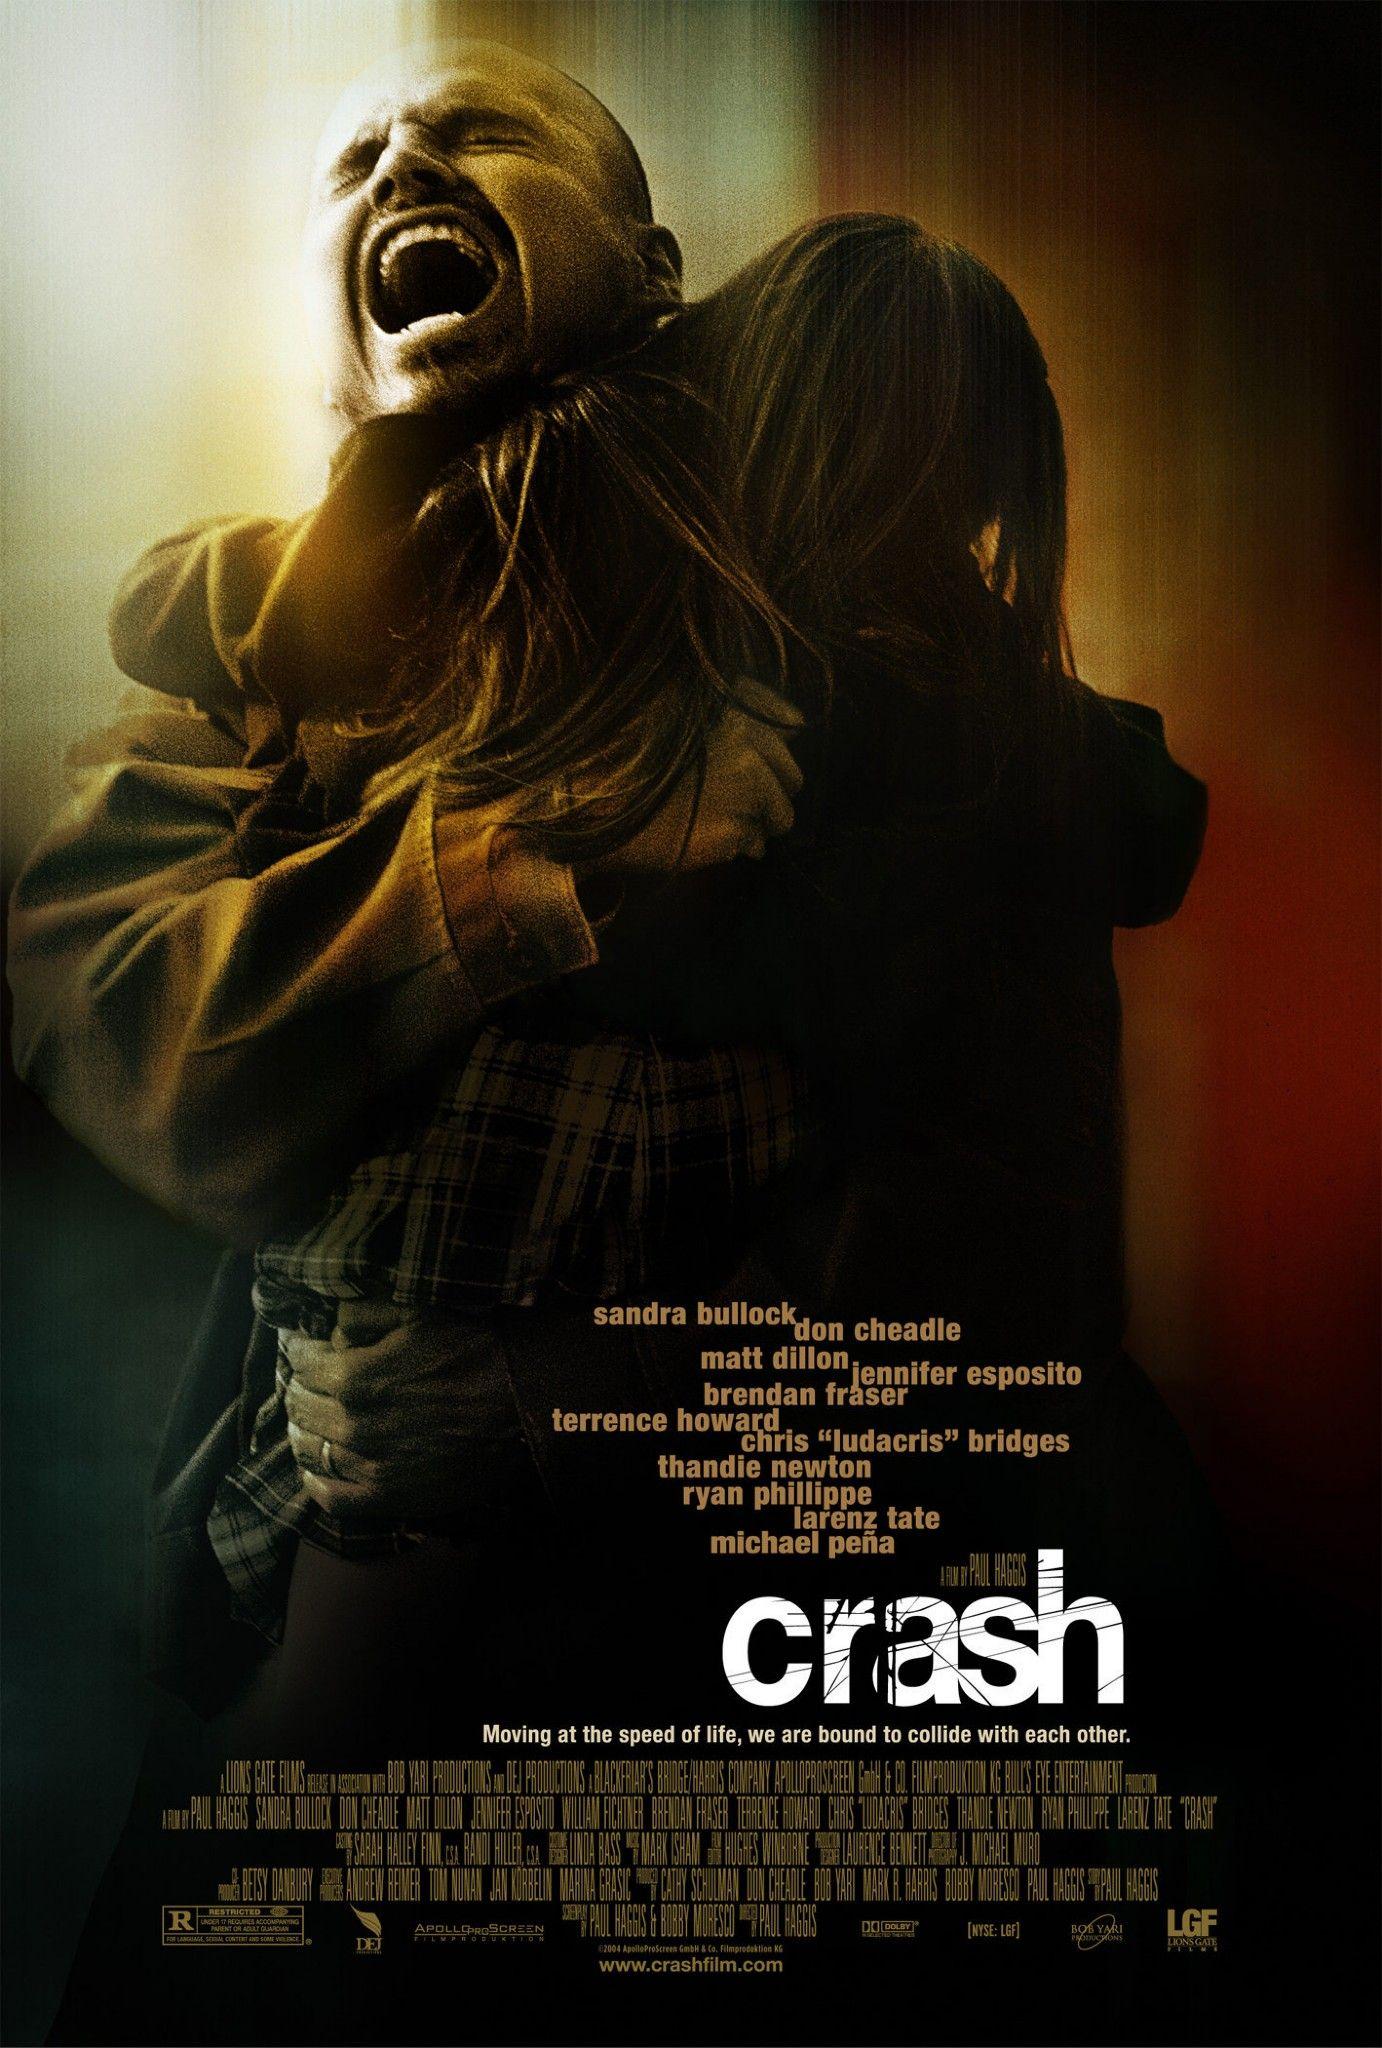 Crash 2005 oscar winning movies good movies